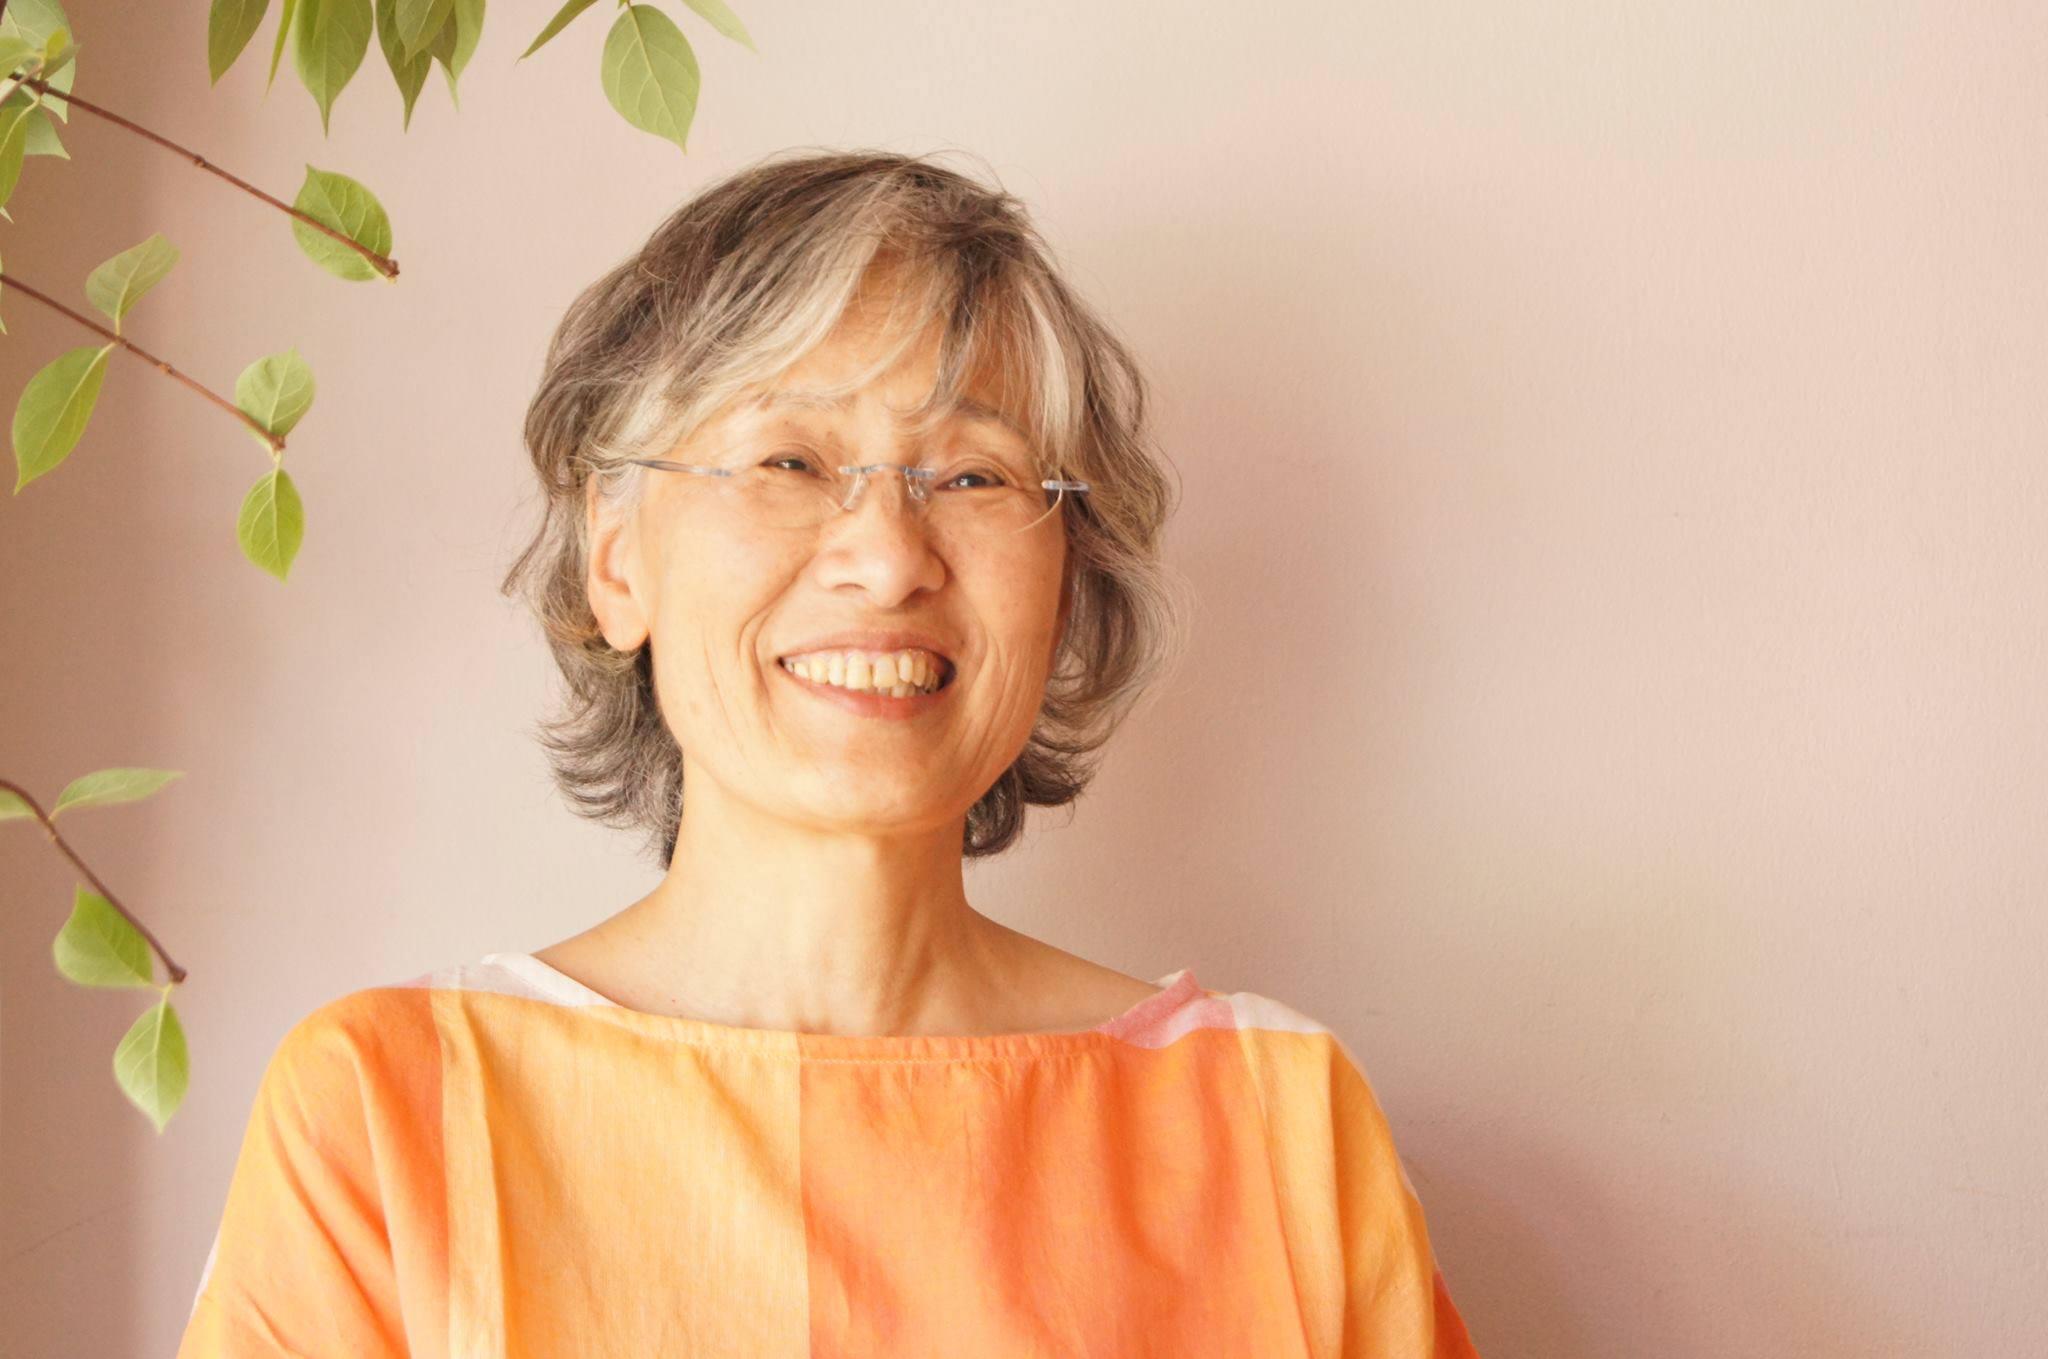 Chiaki Hashimoto / 橋本 ちあき